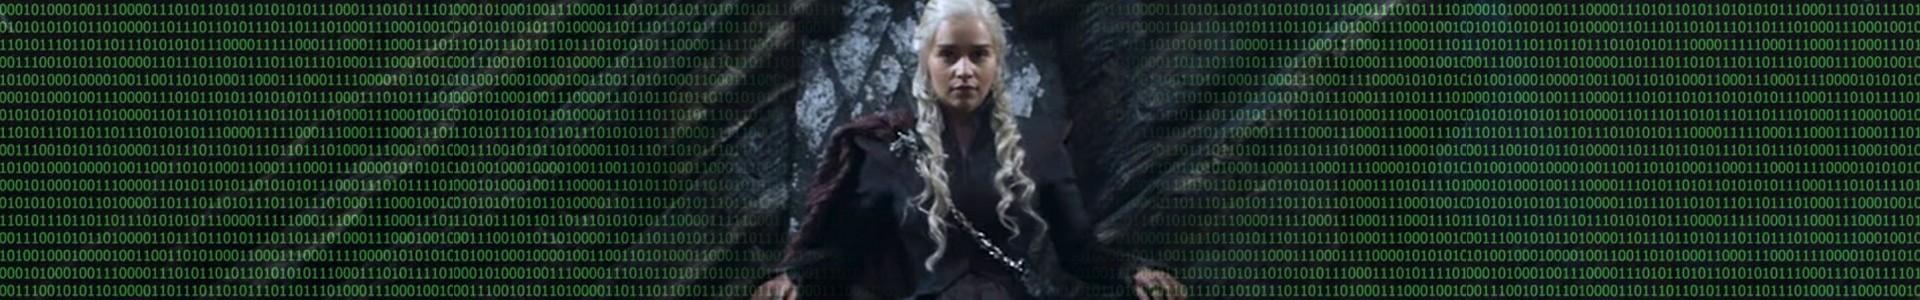 Hackers roubaram roteiro inédito de Game Of Thrones